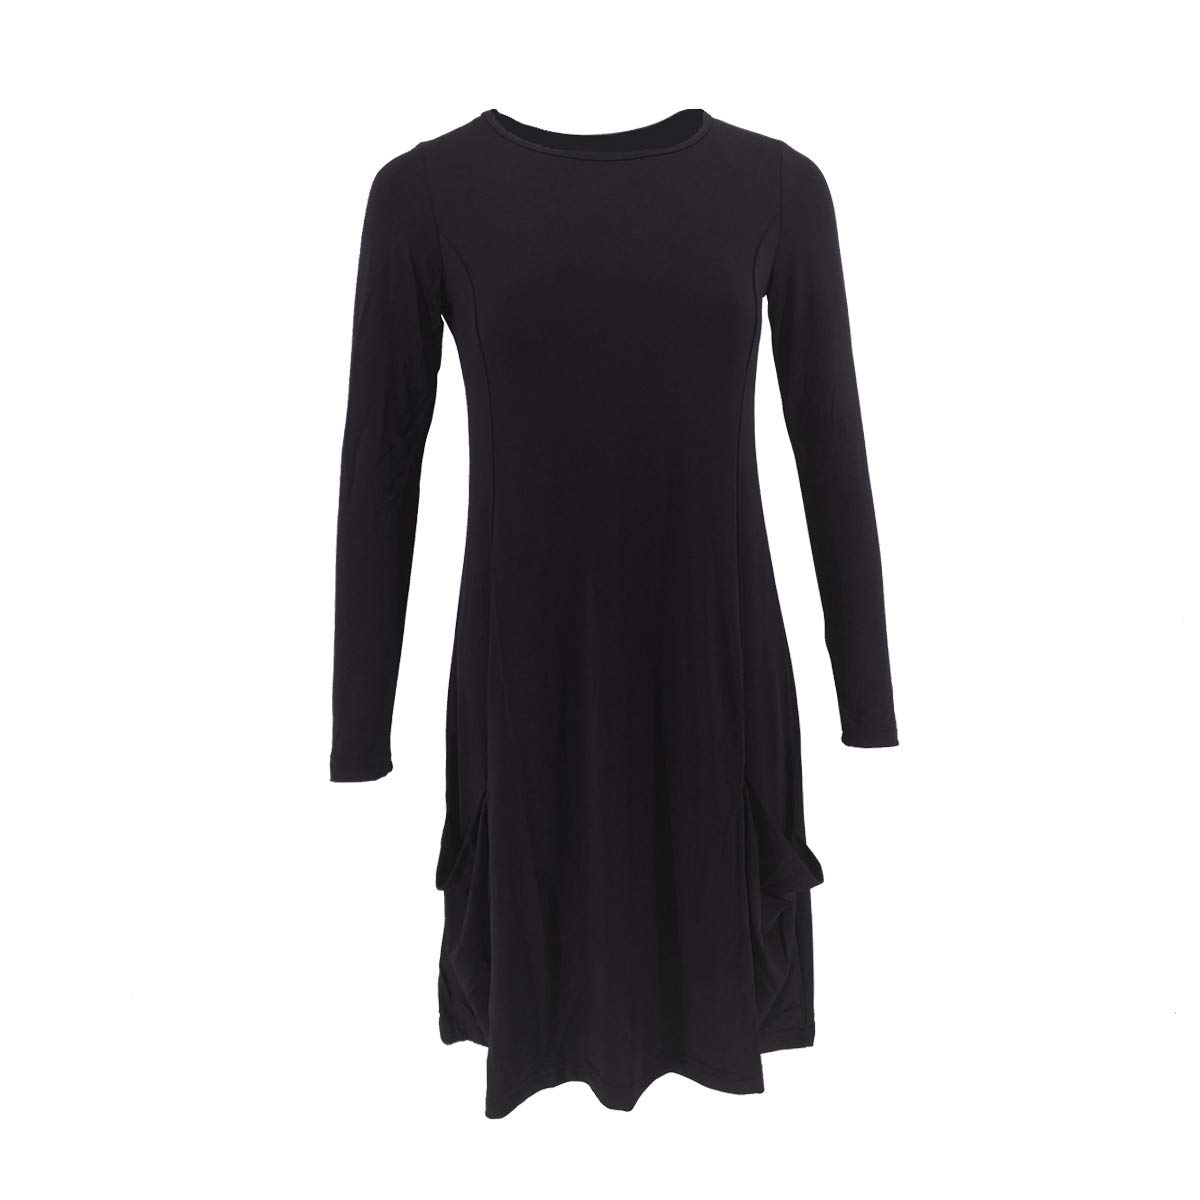 Skang Casual Robe Femme Grande Taille Robe Pull Hiver Solide Pull Oversize Tunique Mini Robe Sweat Manches Longues Col Rond Automne Tunique avec Poches Chaude Casual Mini Dress